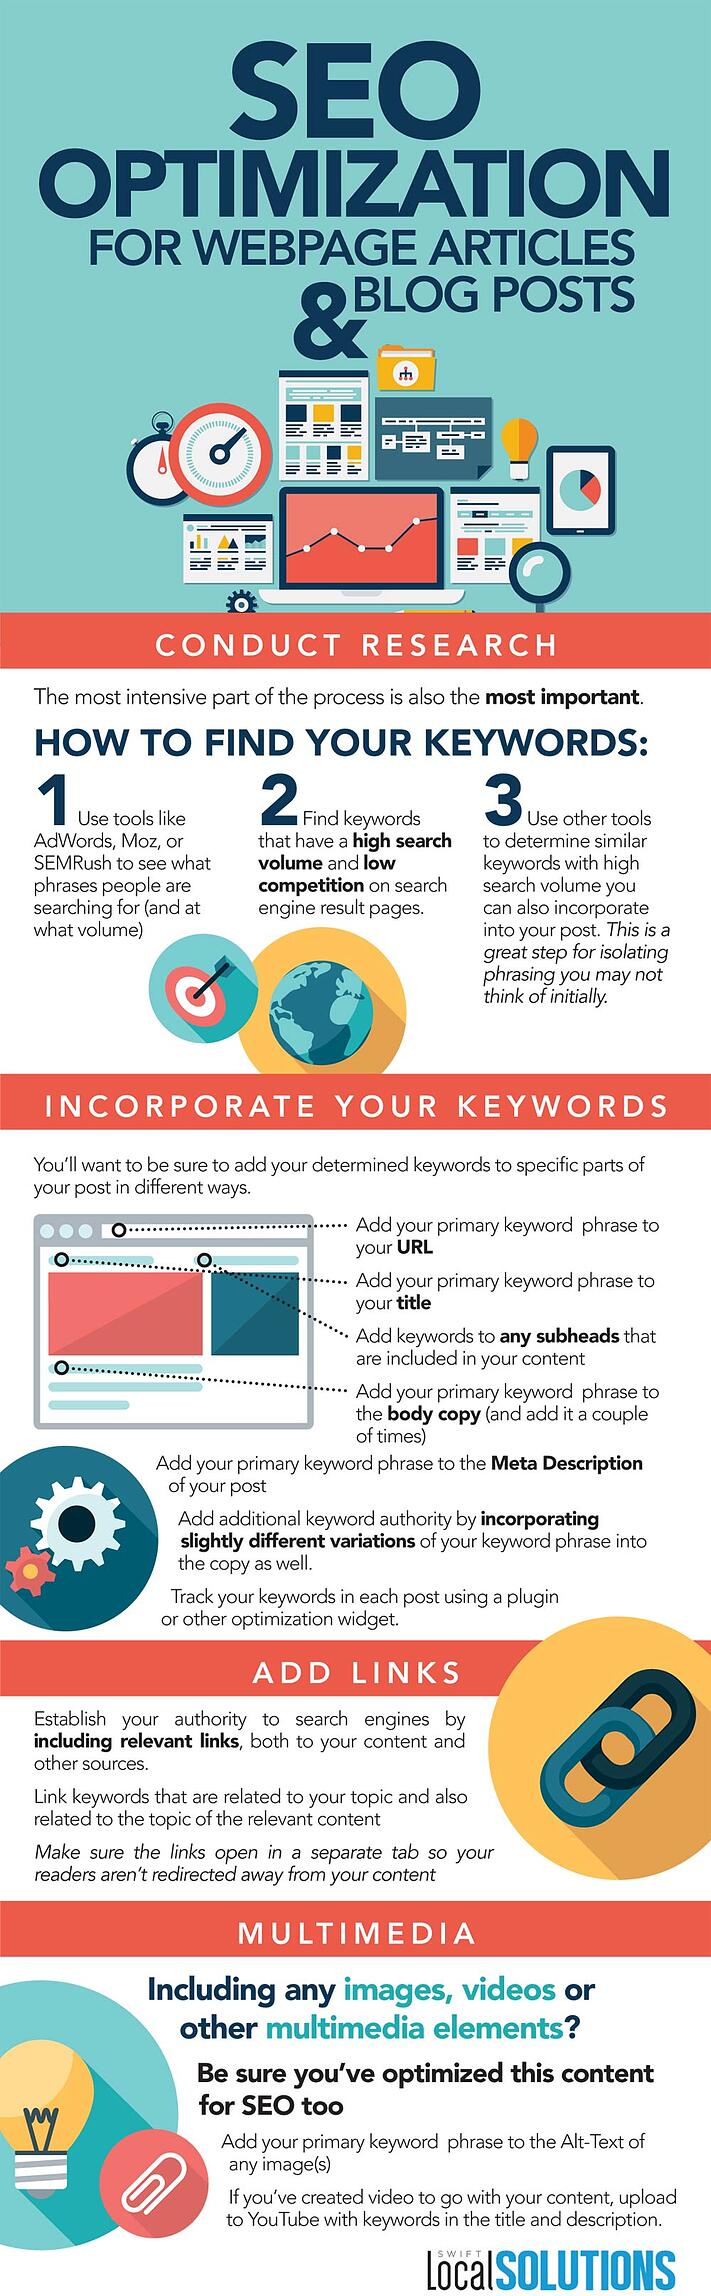 Optimizing-Blog-Posts-SEO-Infographic.jpg